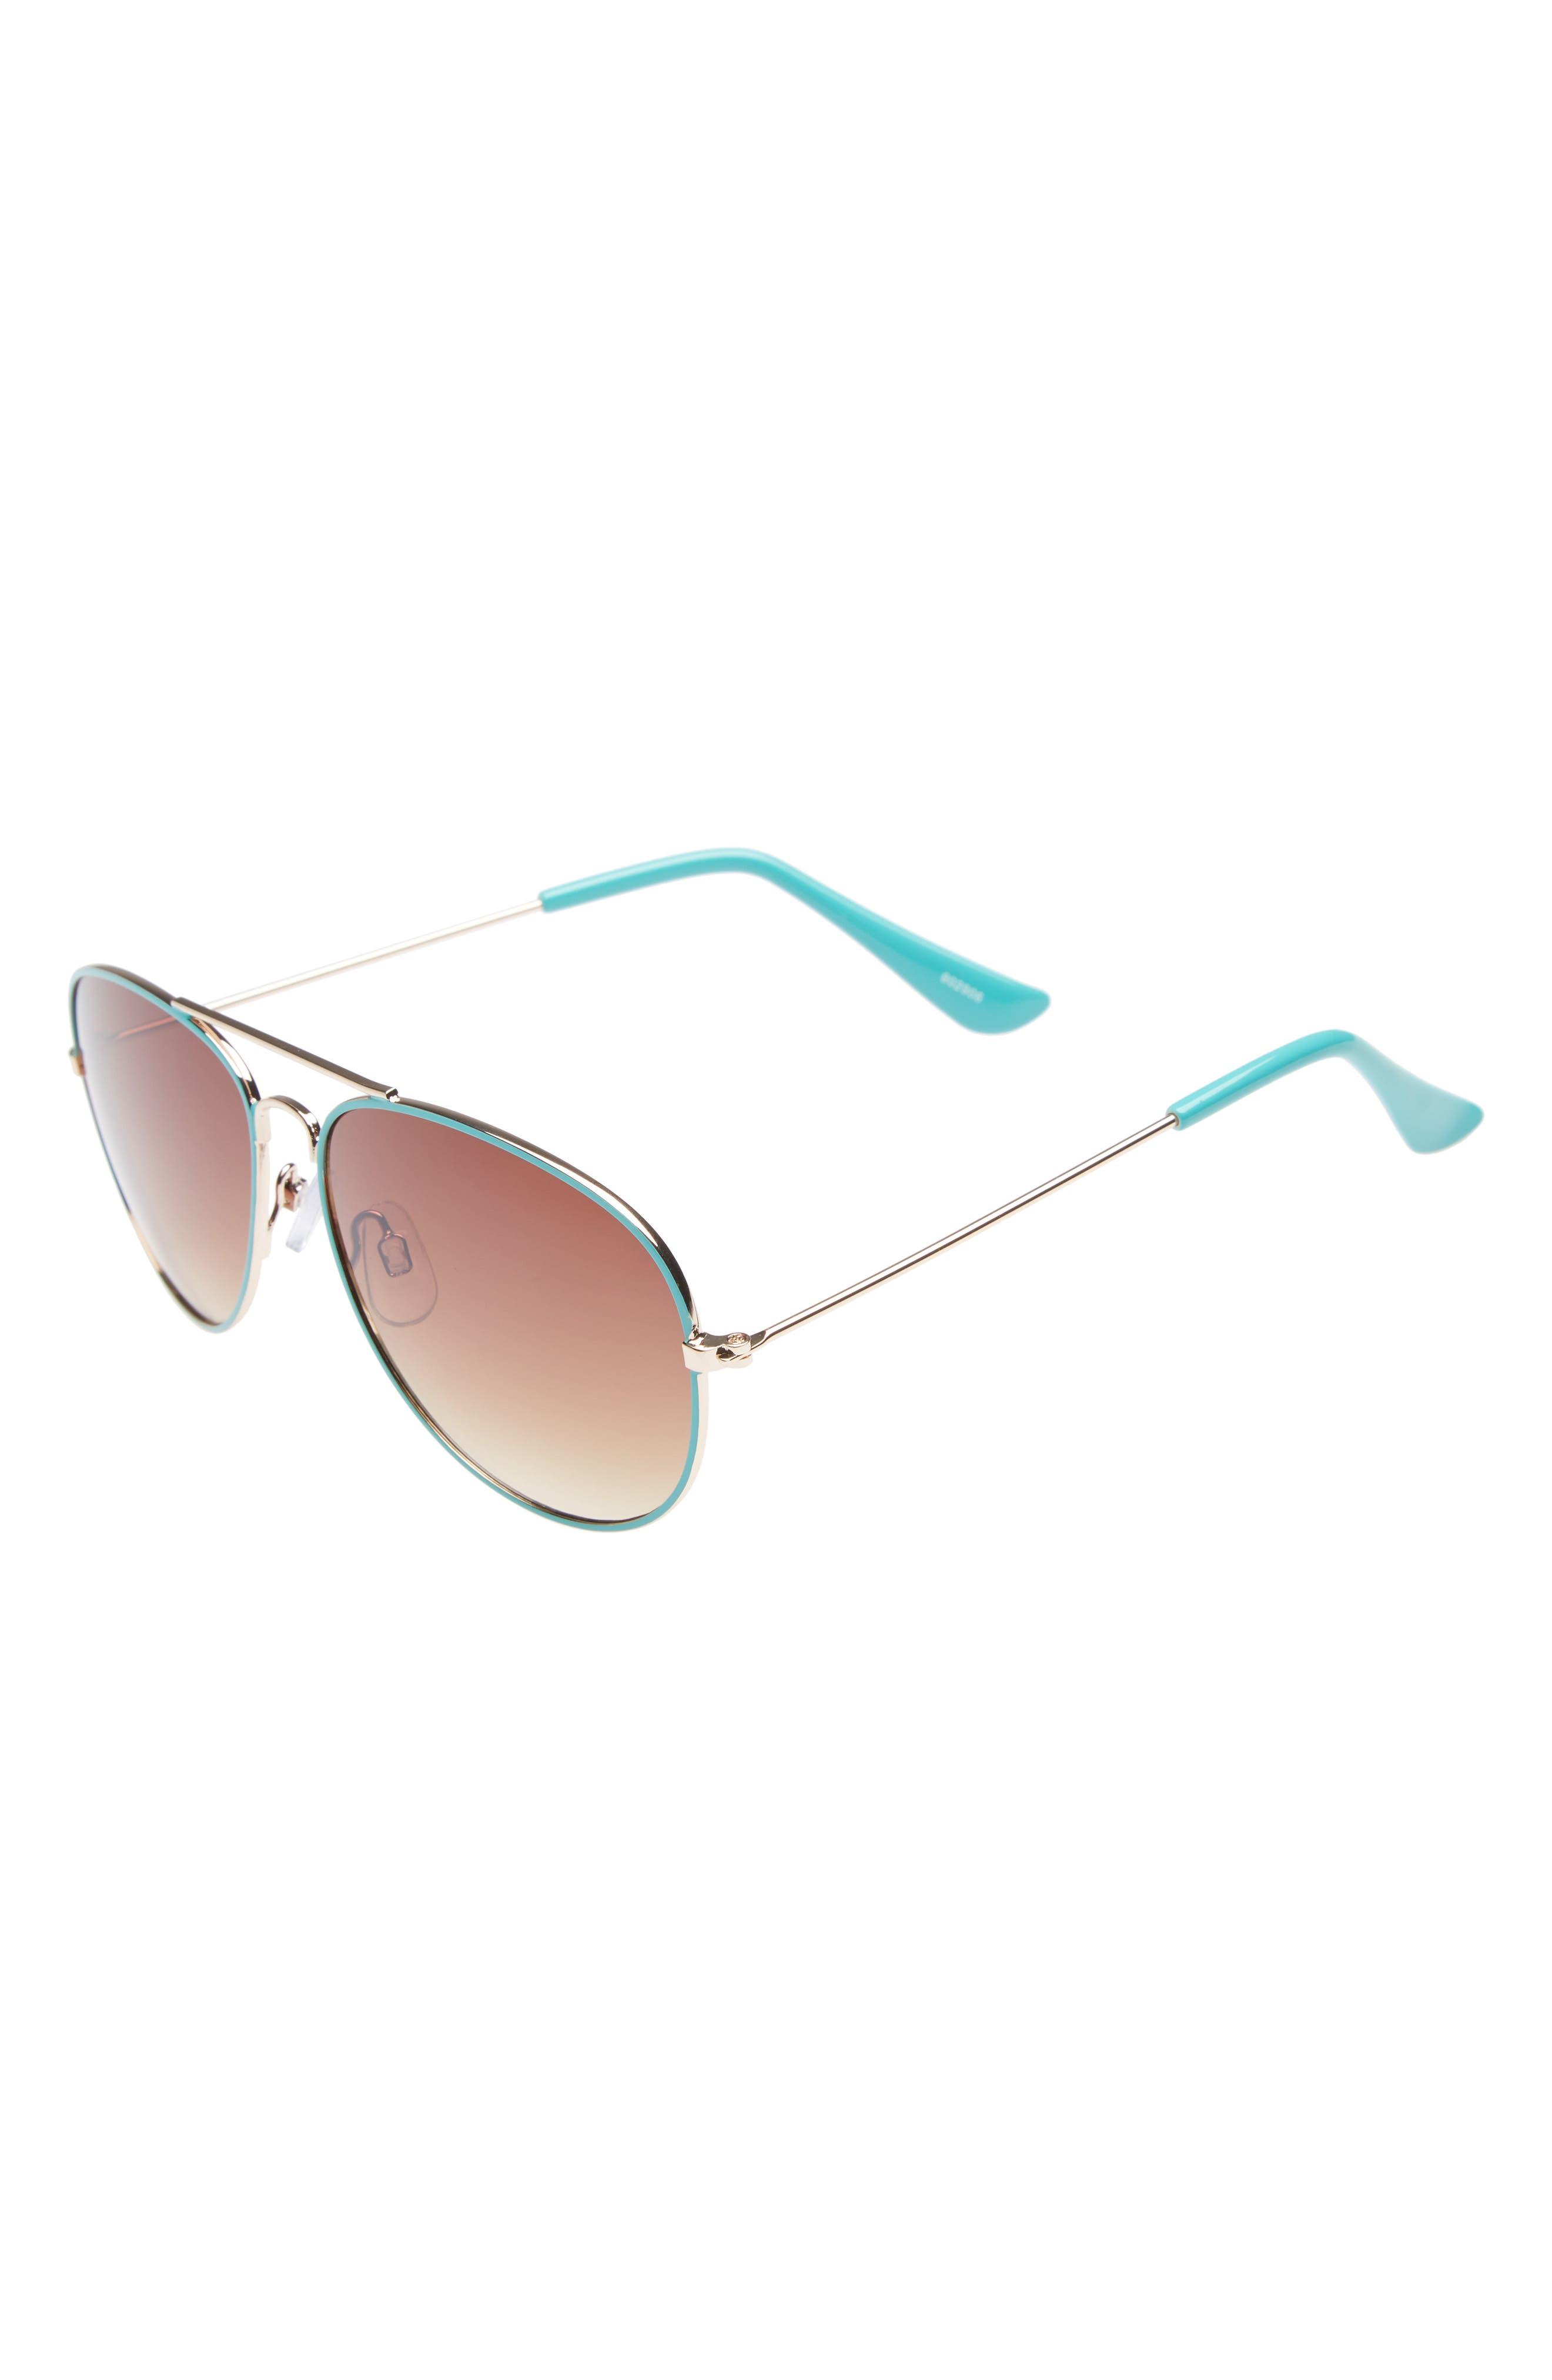 Aviator Sunglasses,                         Main,                         color, 710